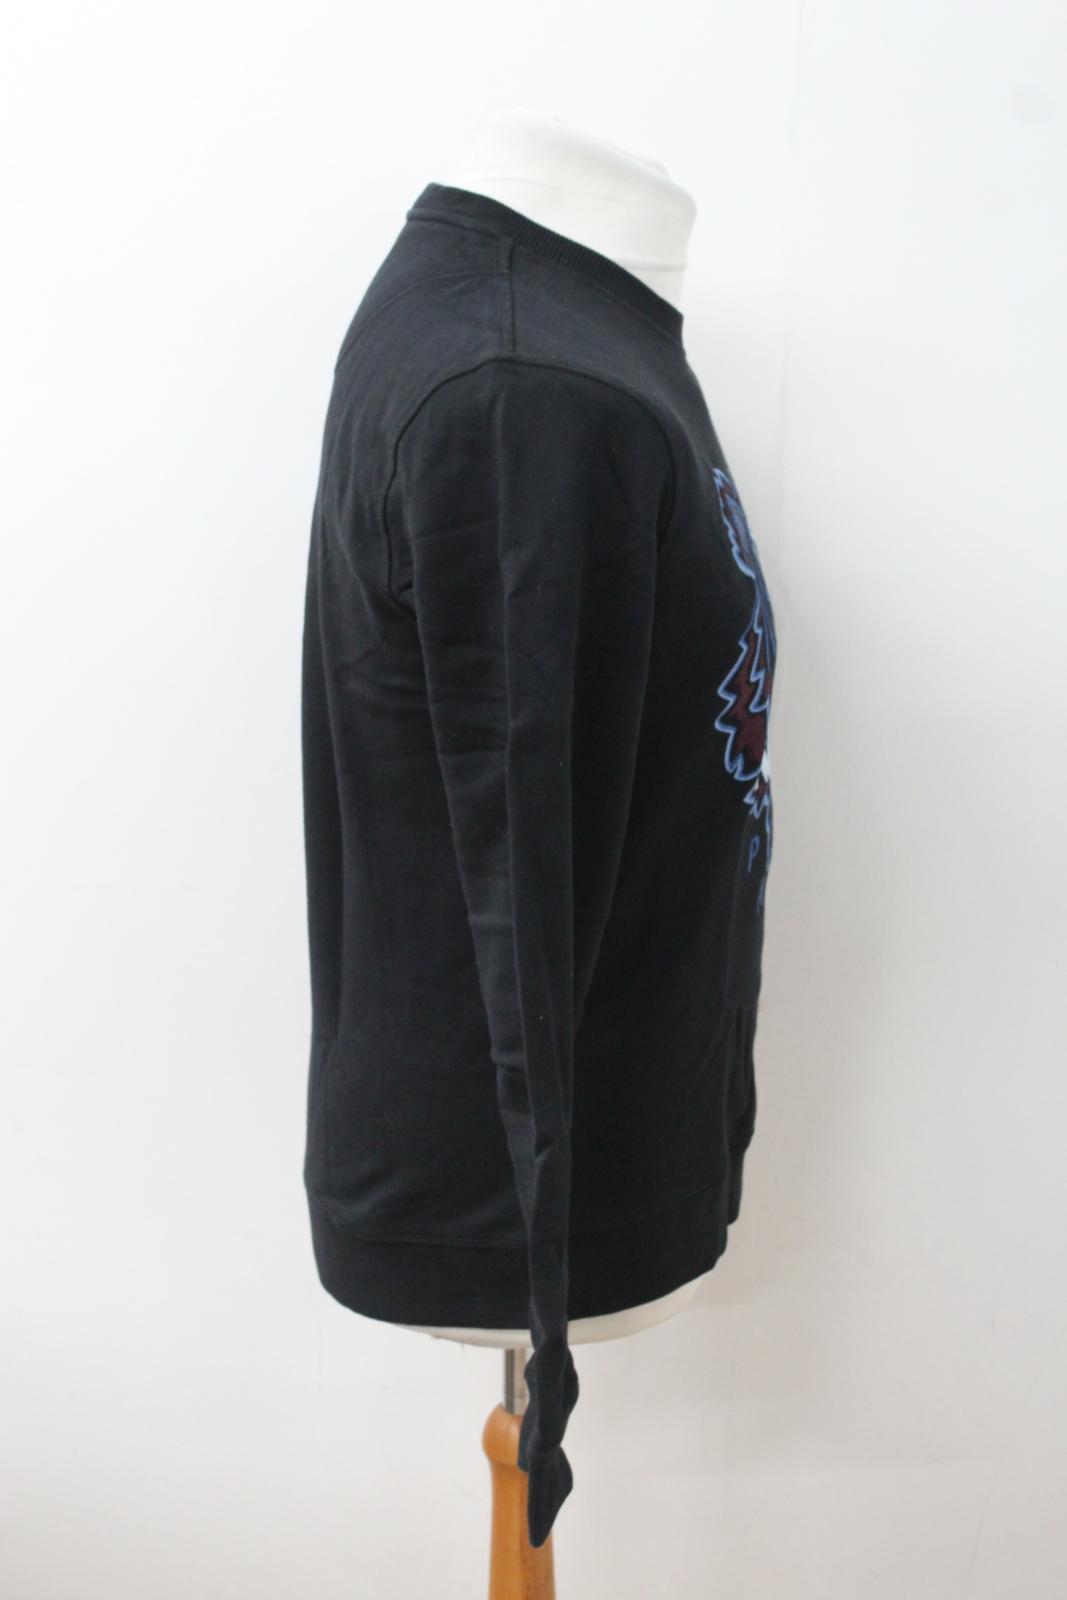 a3c71648 KENZO Men's Black & Blue Tiger Head Logo Crew Neck Jumper Sweatshirt Size M  3 3 of 12 ...